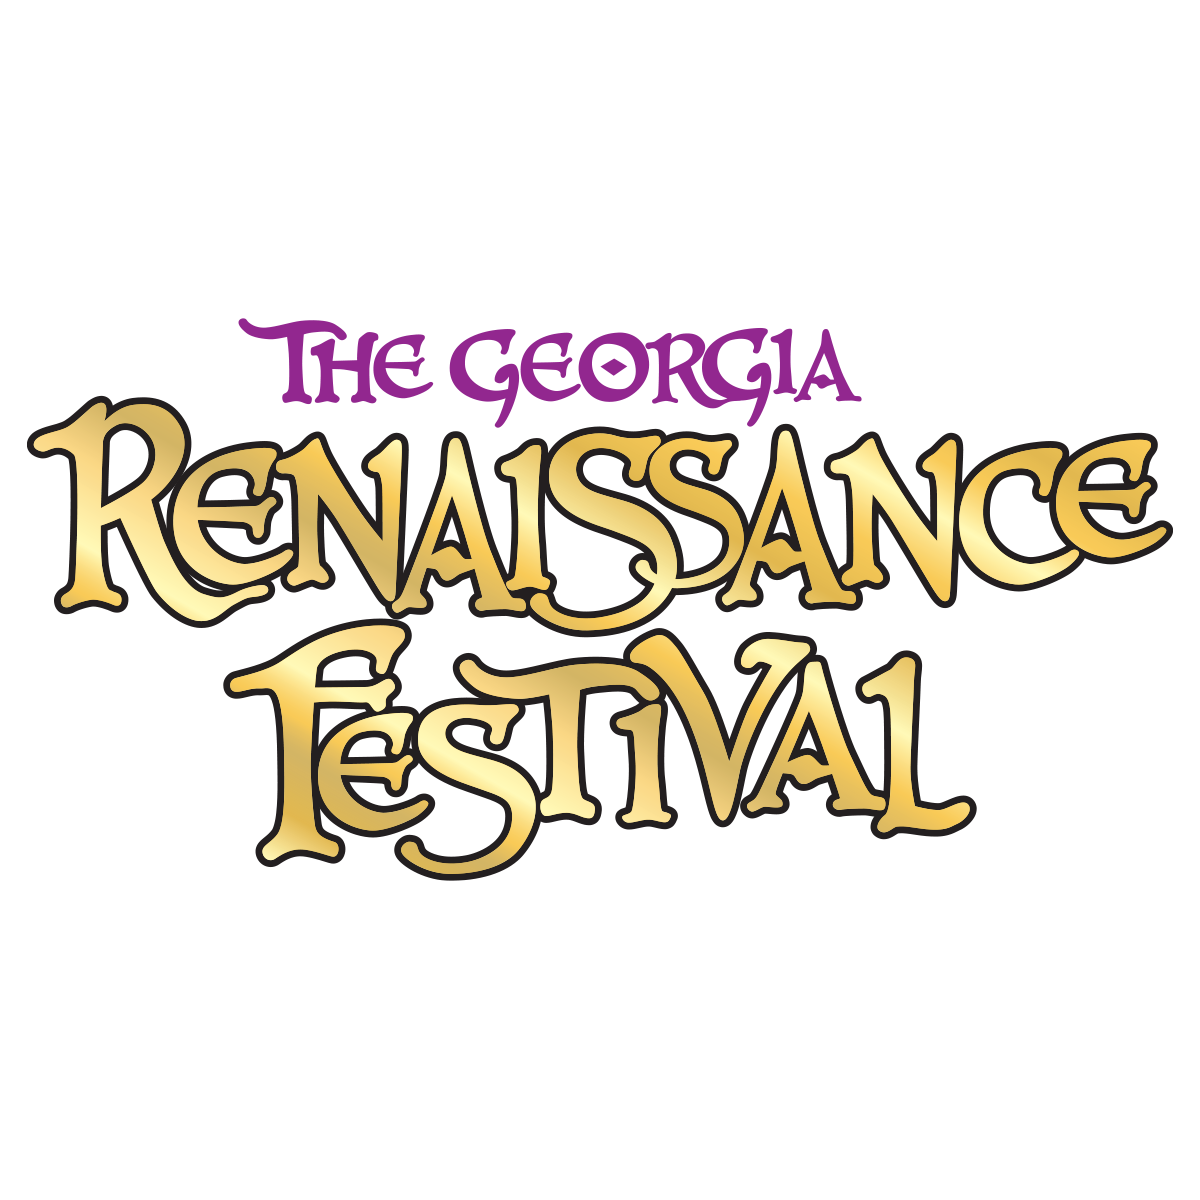 Georgia Renaissance Festival - Fairburn, GA - Museums & Attractions